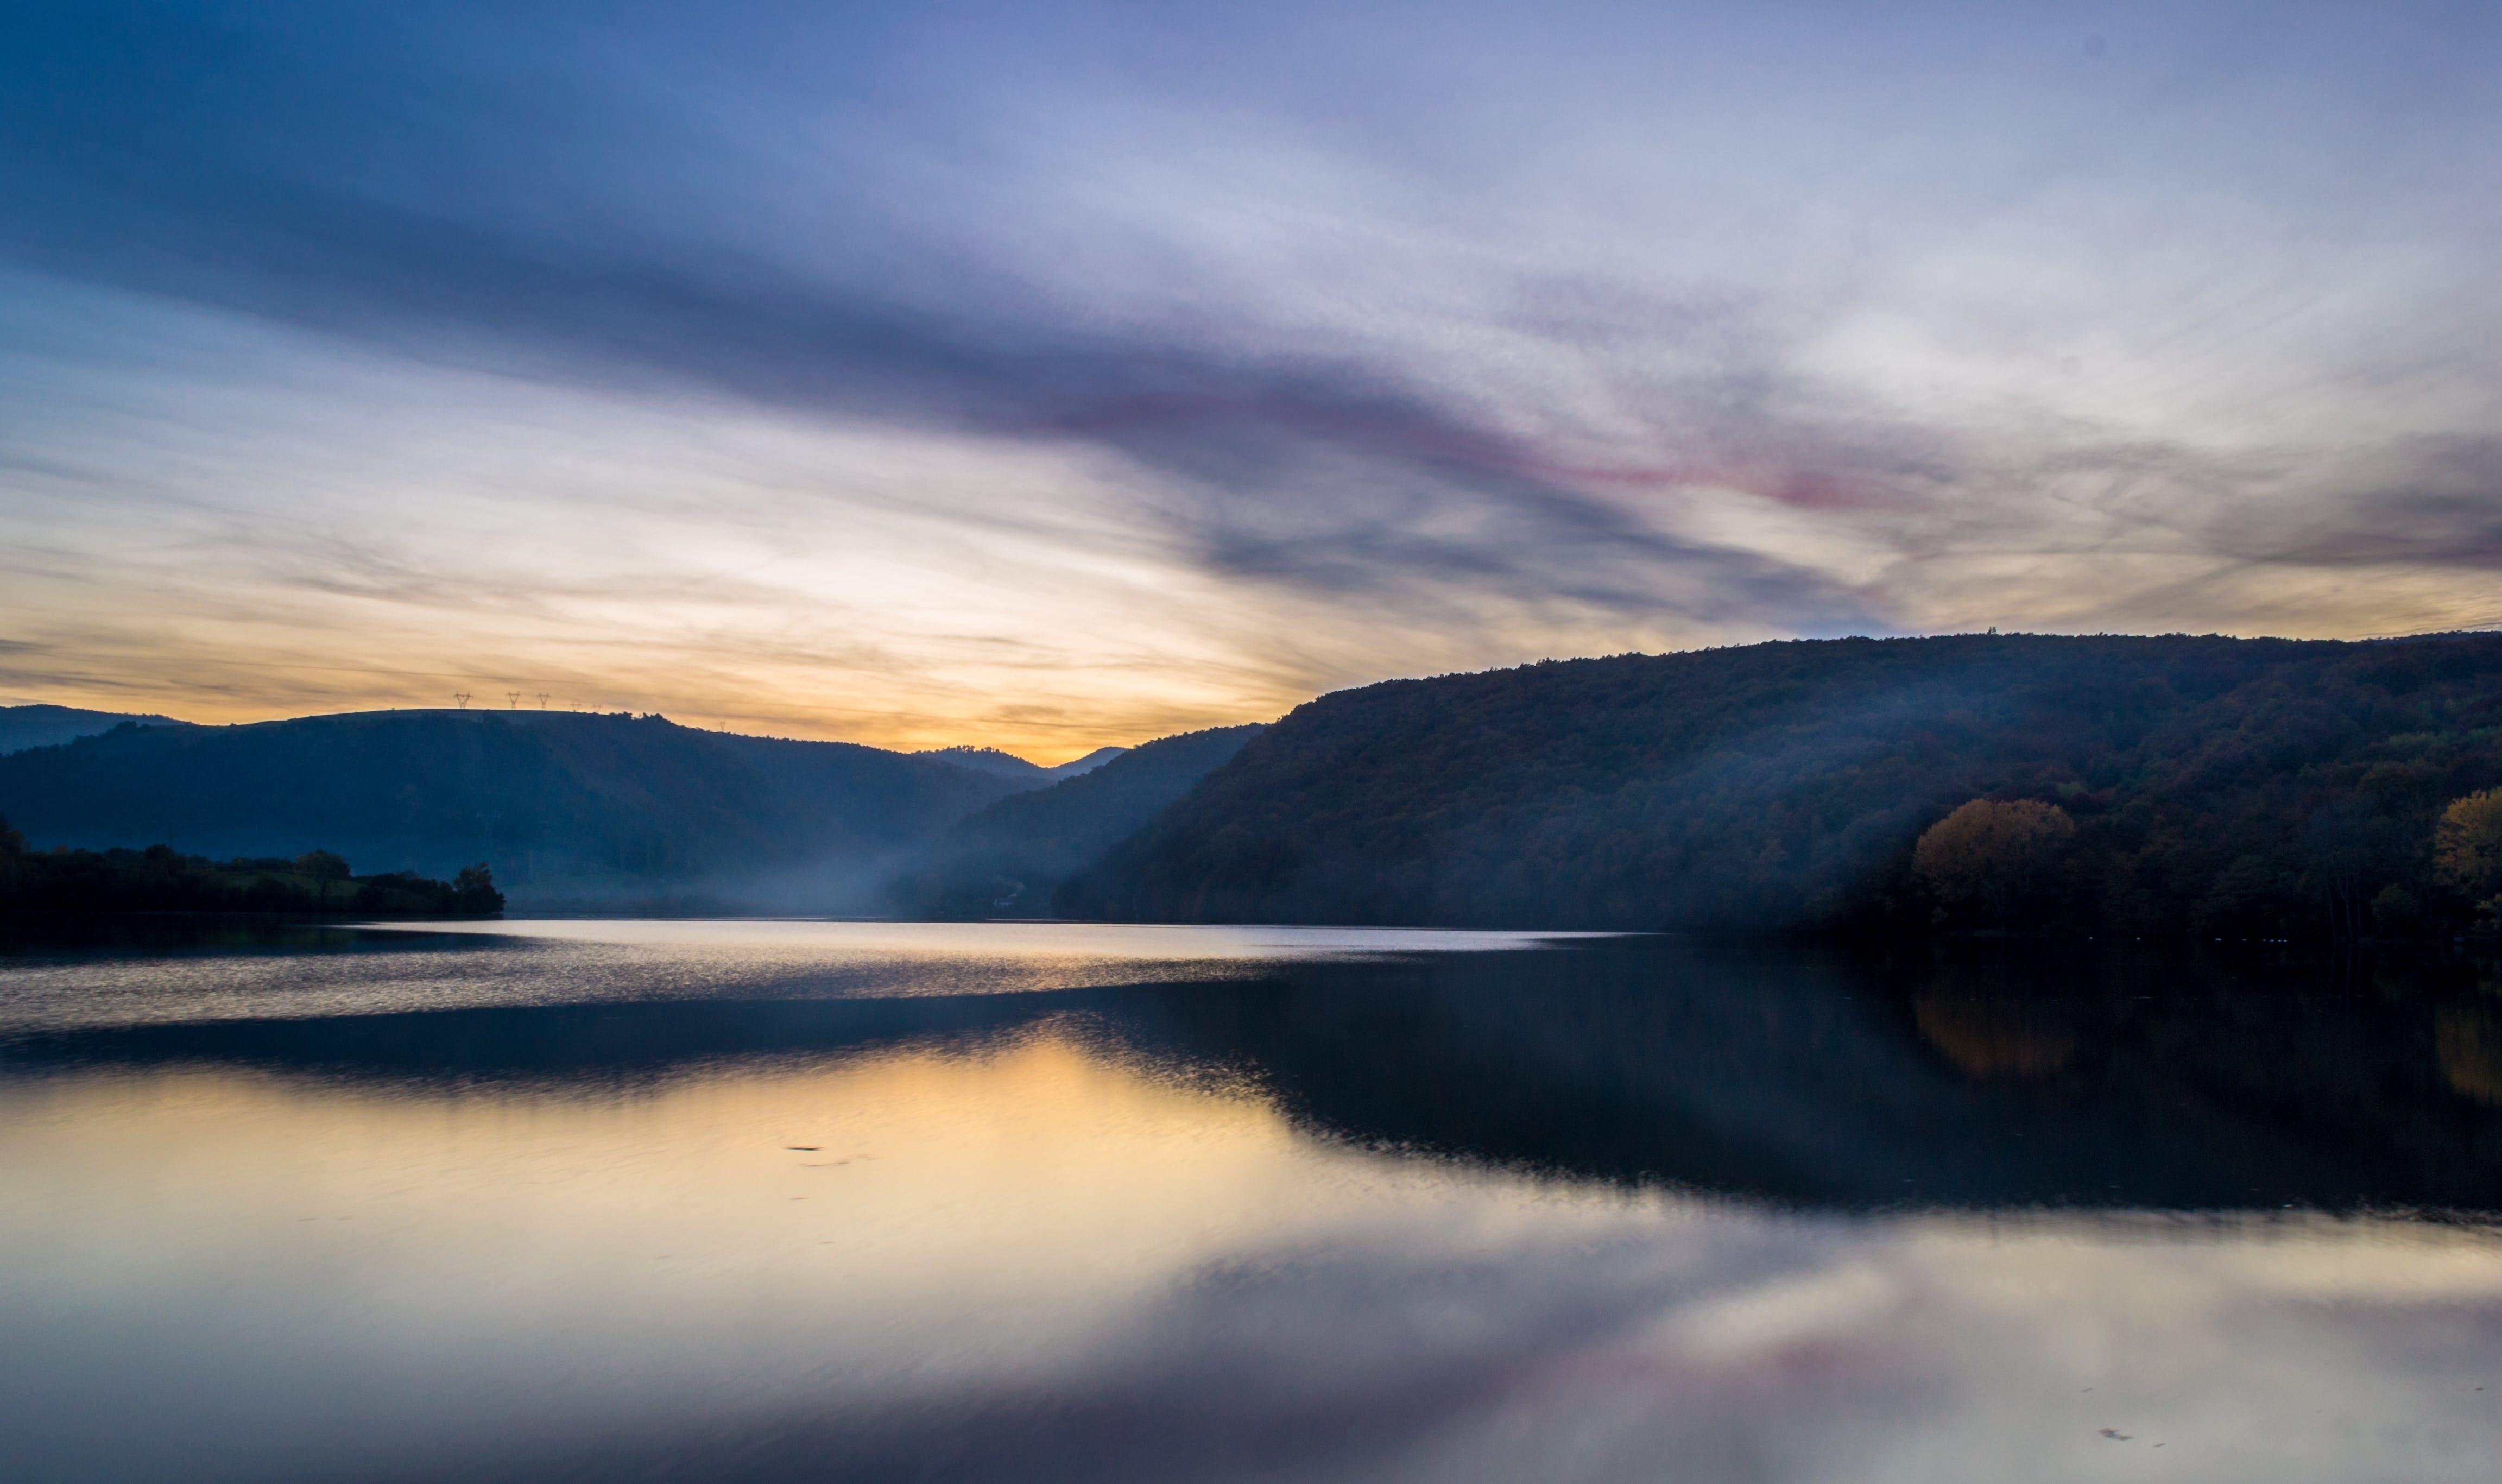 clouds, lake, landscape